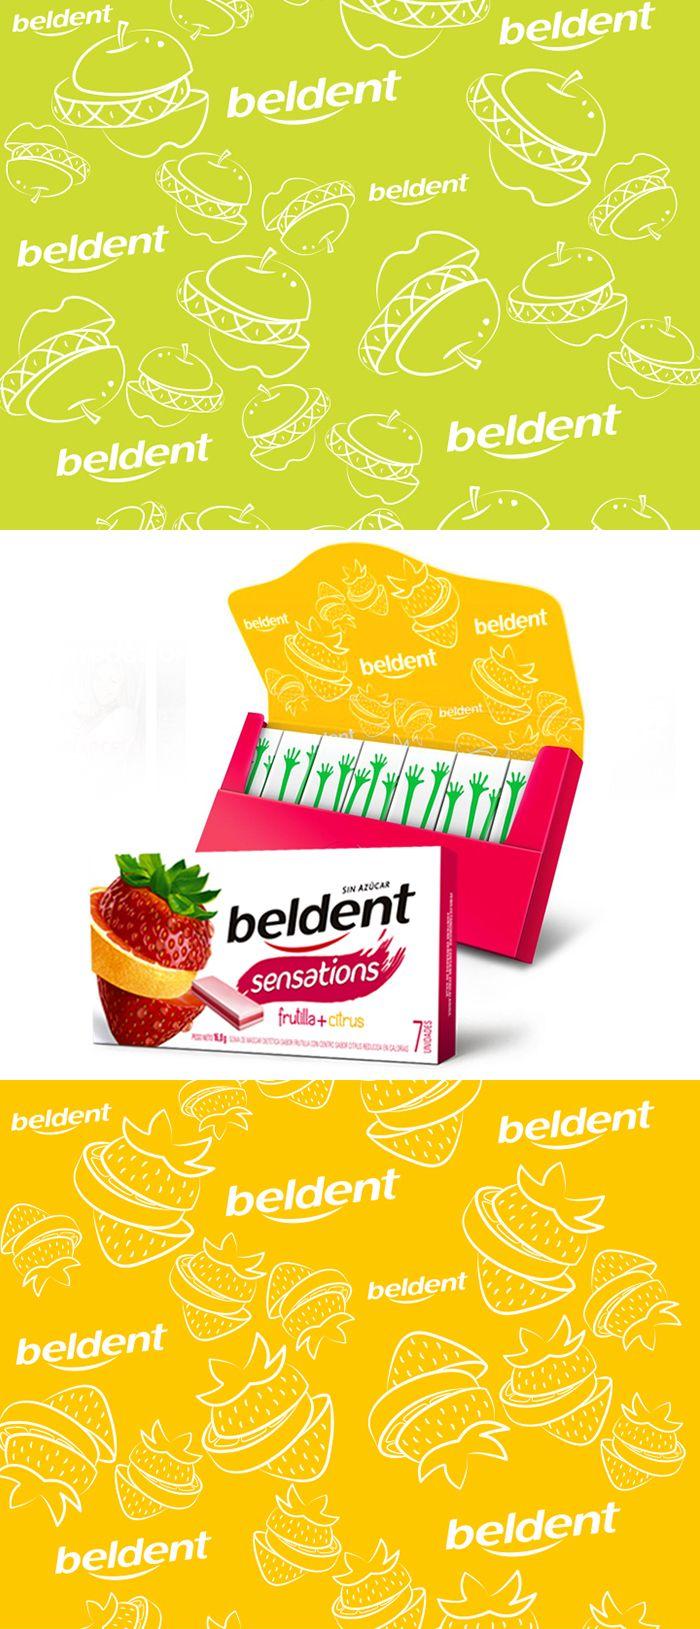 http://samantalukesch.com.ar/imagenes/packaging/beldentsensations.jpg